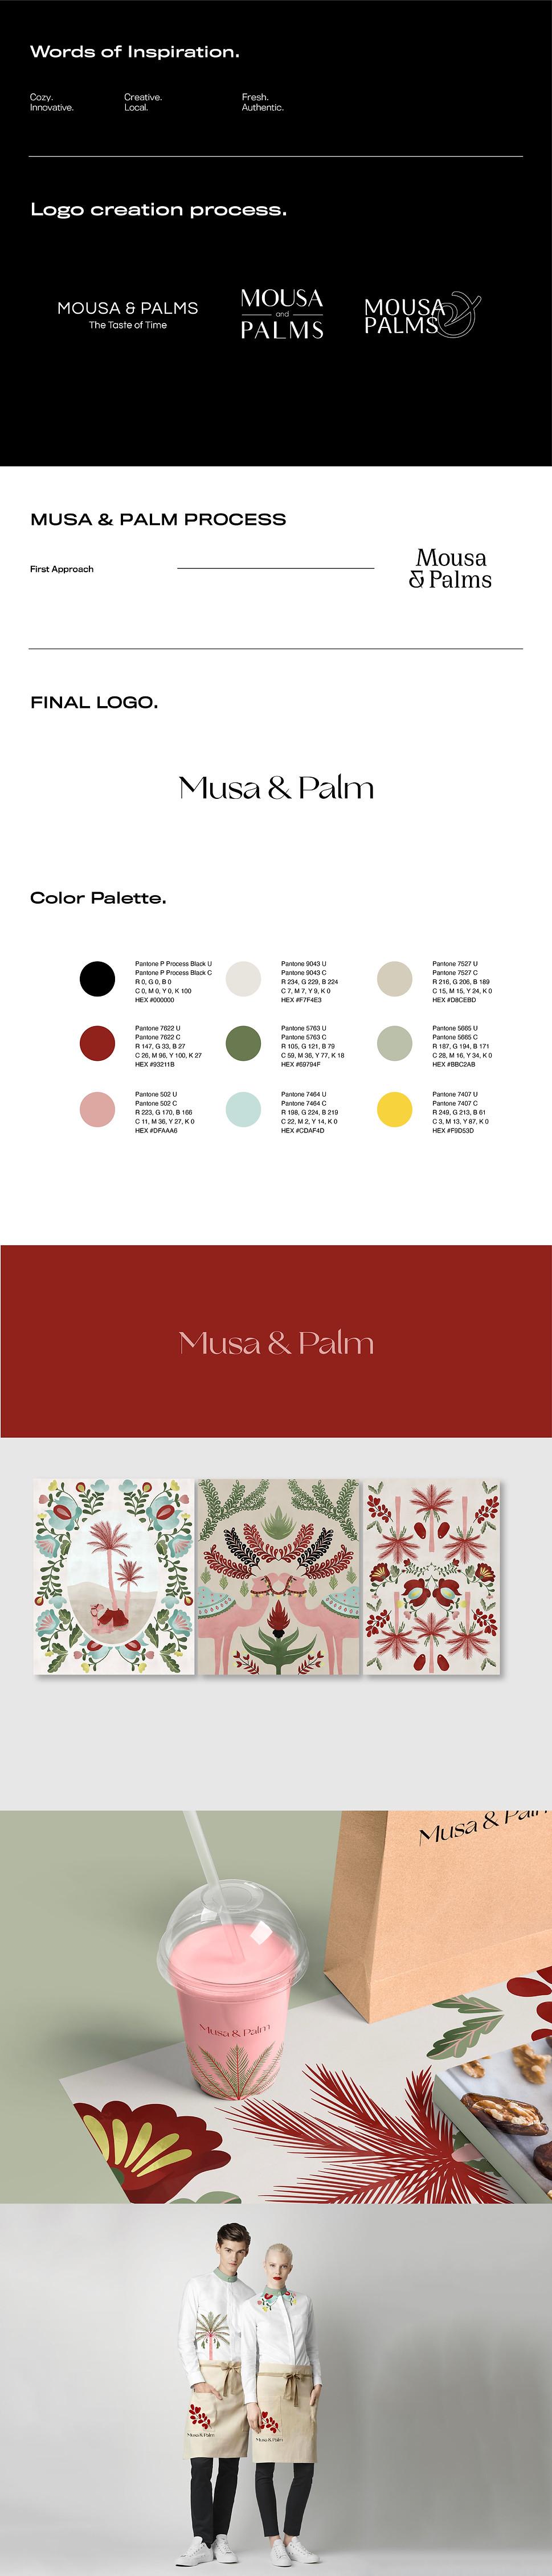 Musa & Palm-01.jpg